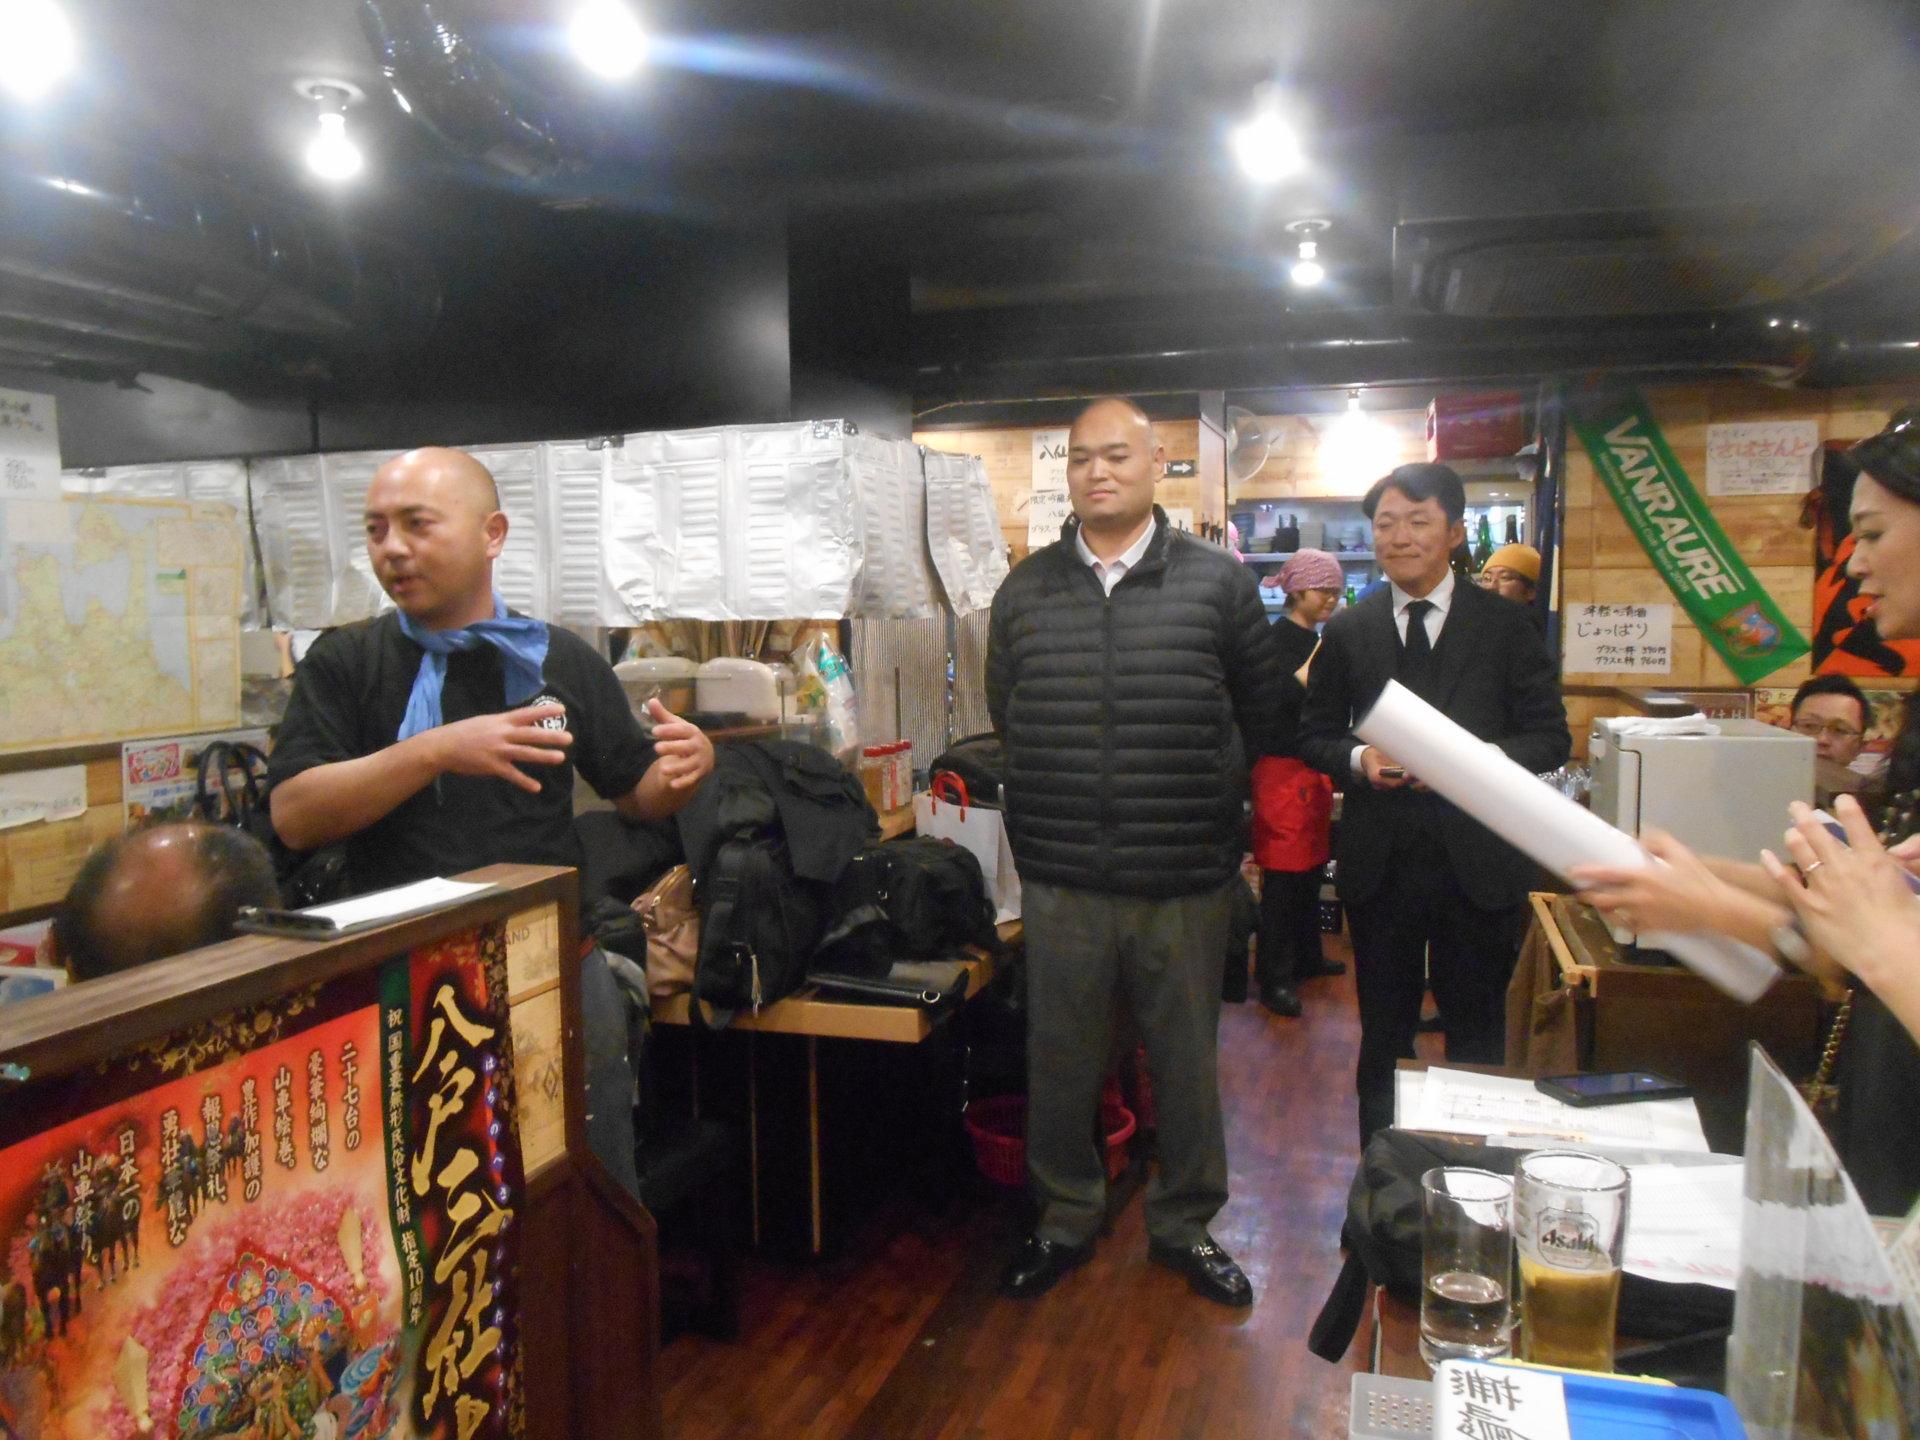 DSCN0598 1920x1440 - 2015年12月21日(月) AOsuki忘年会開催しました。